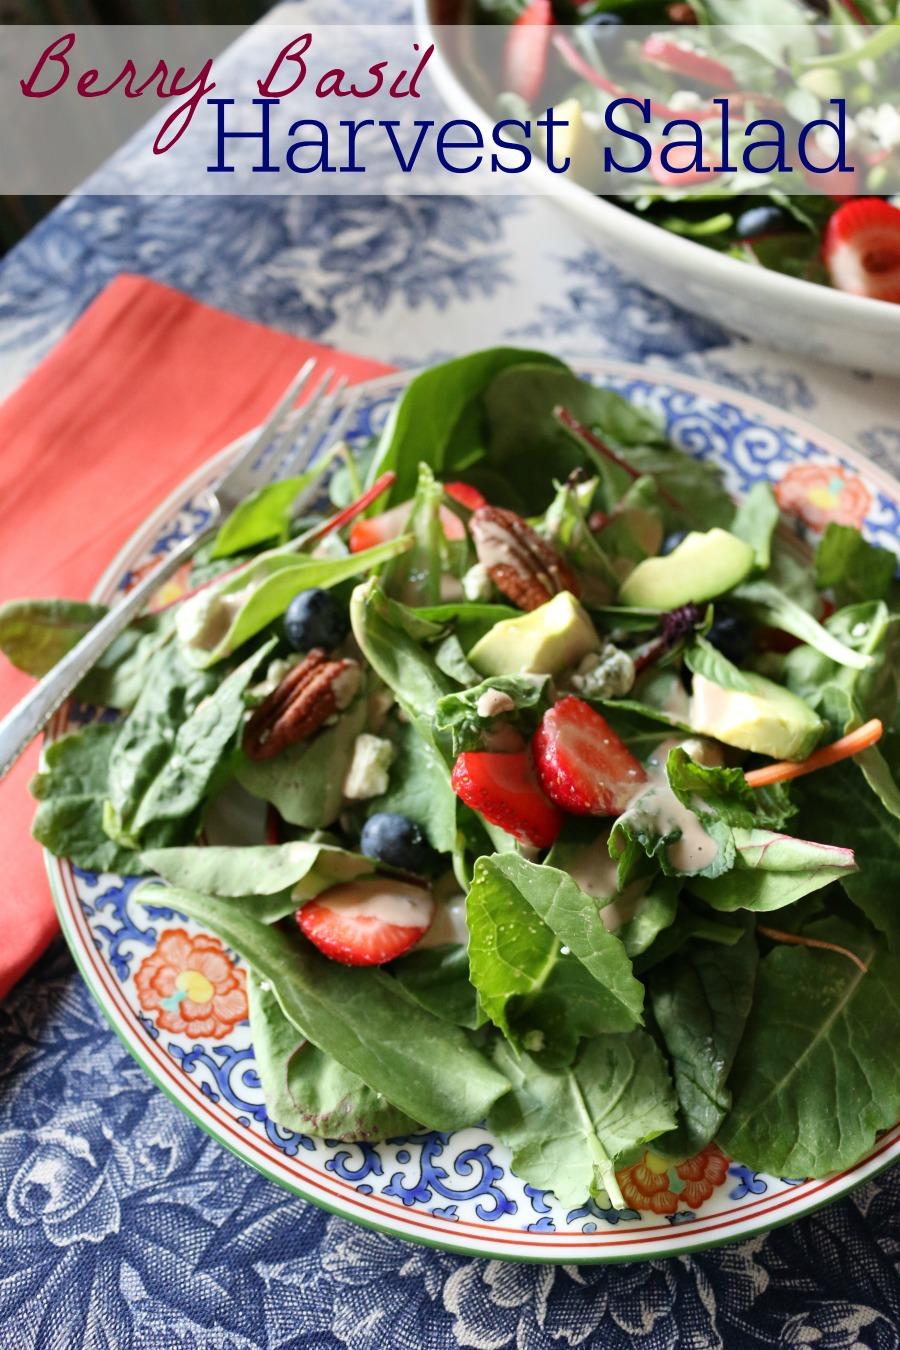 Berry Basil Harvest Salad with a slightly sweet honey vinaigrette.